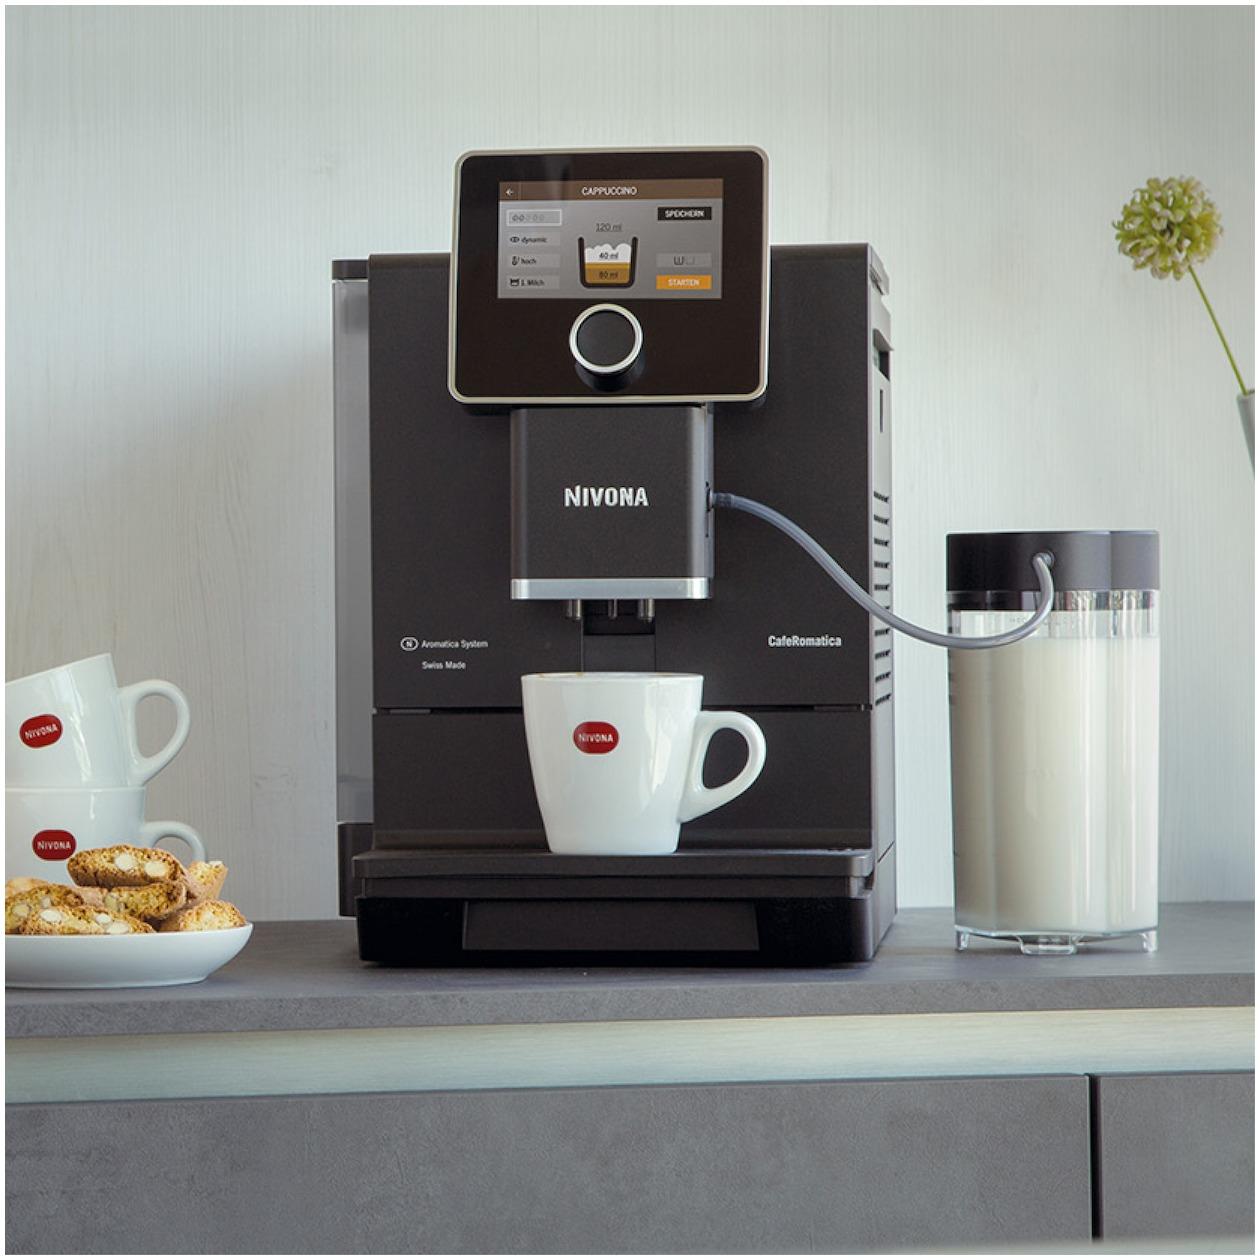 Nivona volautomaat CafeRomatica 960 - Prijsvergelijk